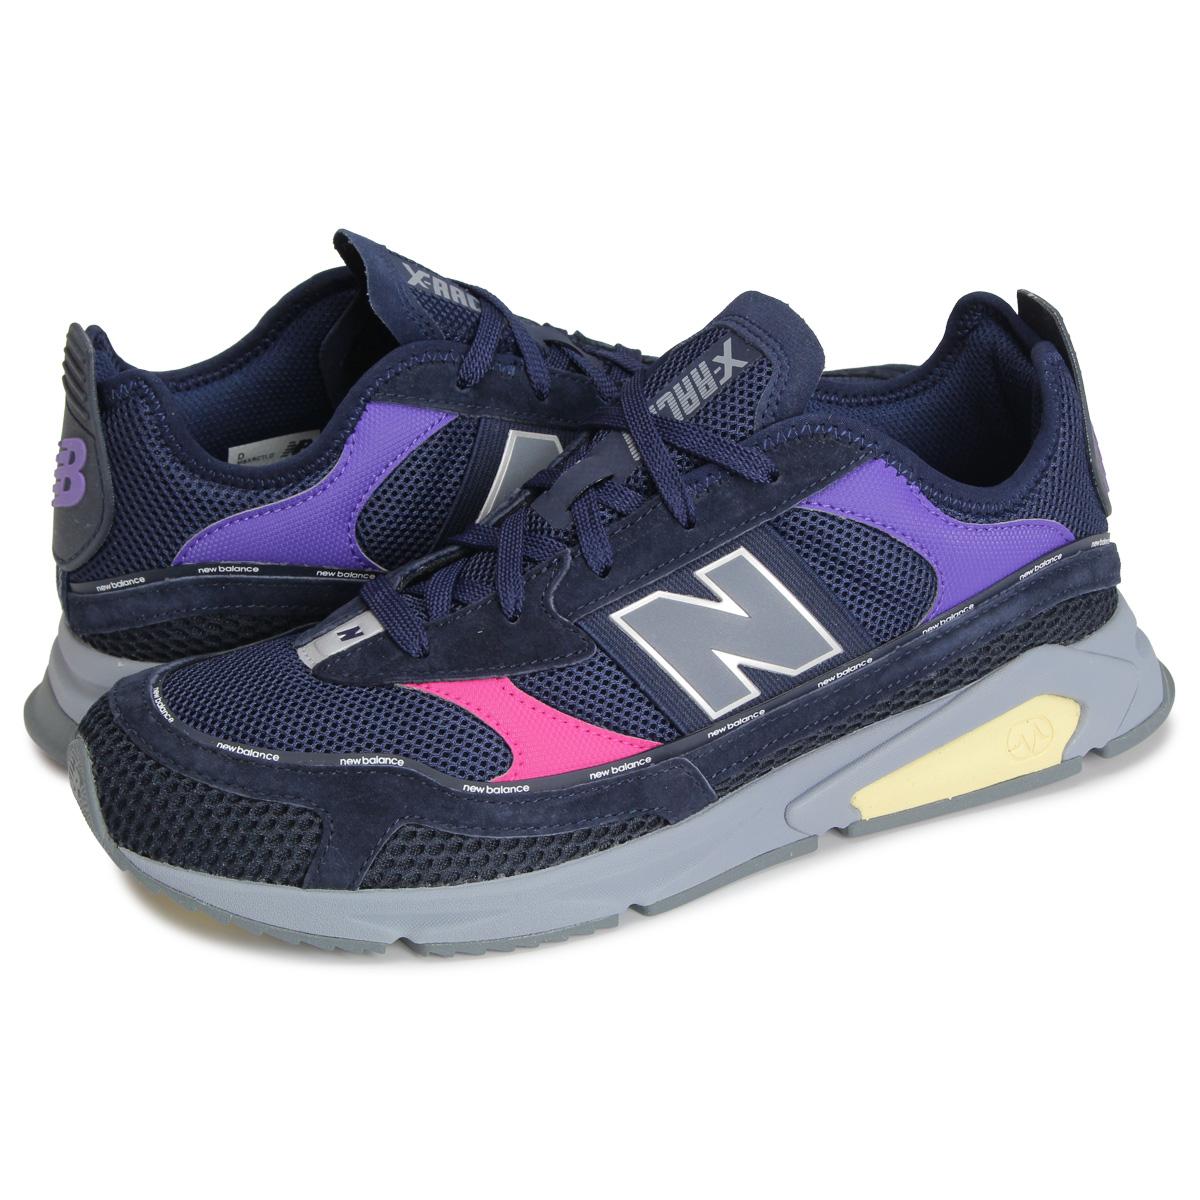 9874ee942e089 new balance MSXRCTLD New Balance MSXRC sneakers men D Wise black black  [load planned Shinnyu